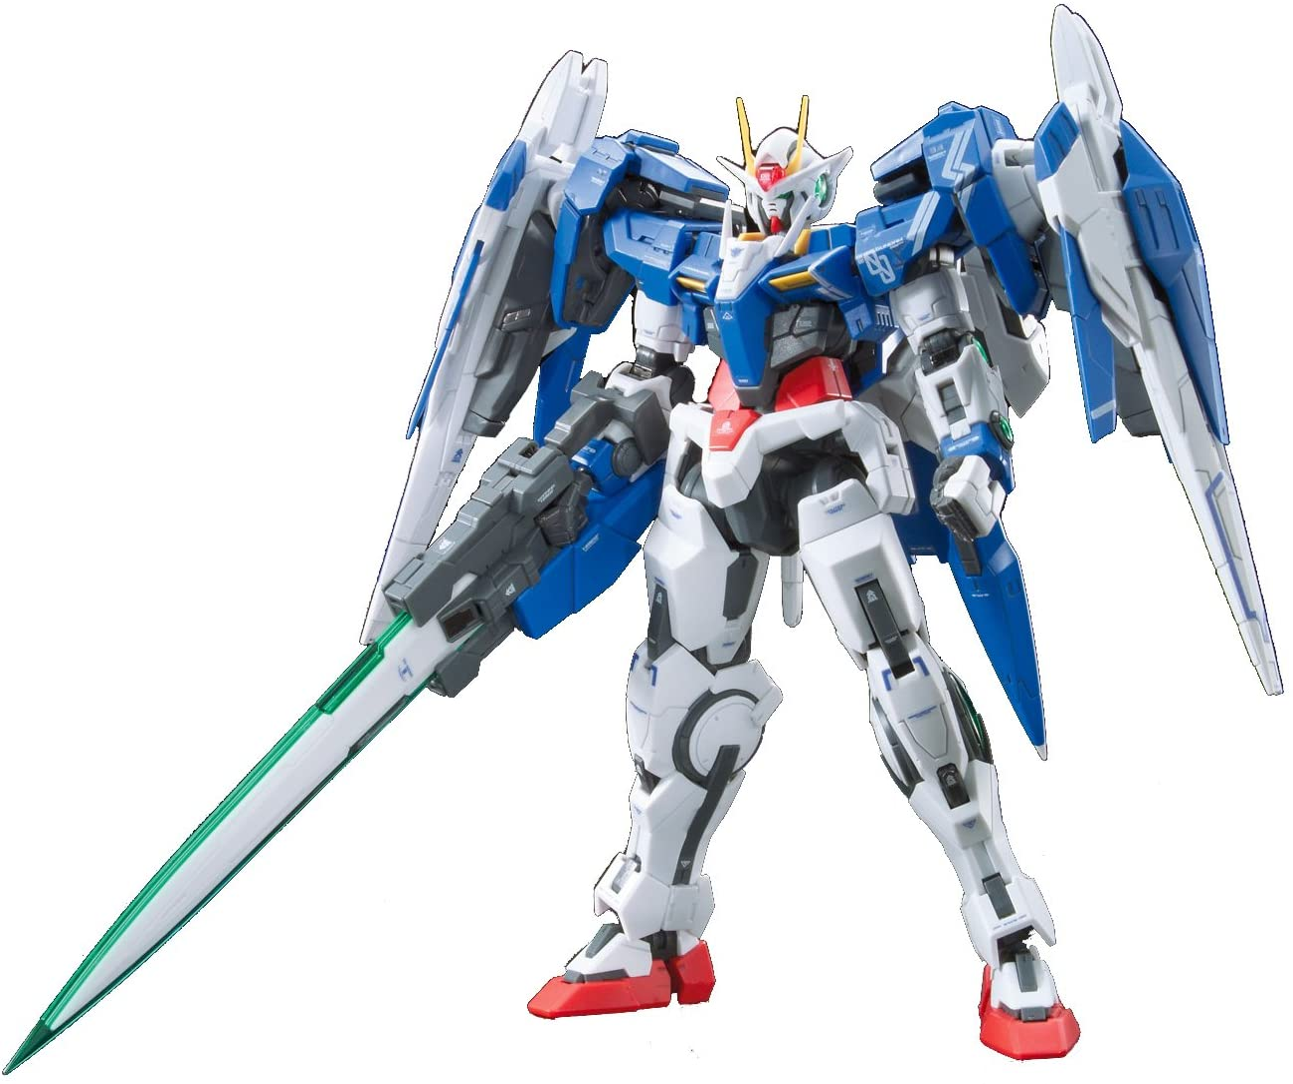 "Bandai Hobby Real Grade 1/144-Scale 00 Raiser Gundam 00"" Action Figure"